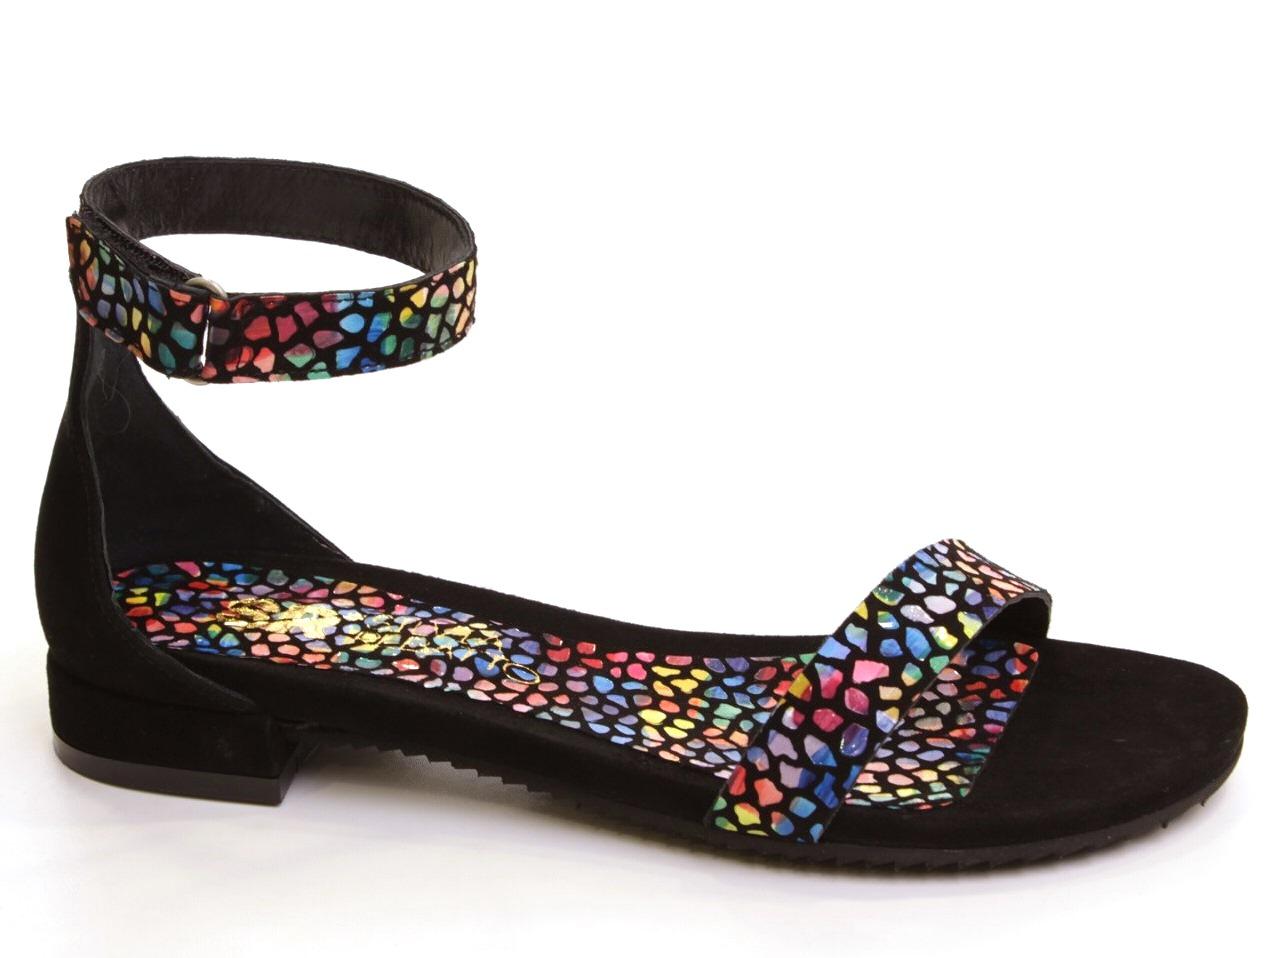 Flat Sandals Silvia Rebatto - 019 S9443